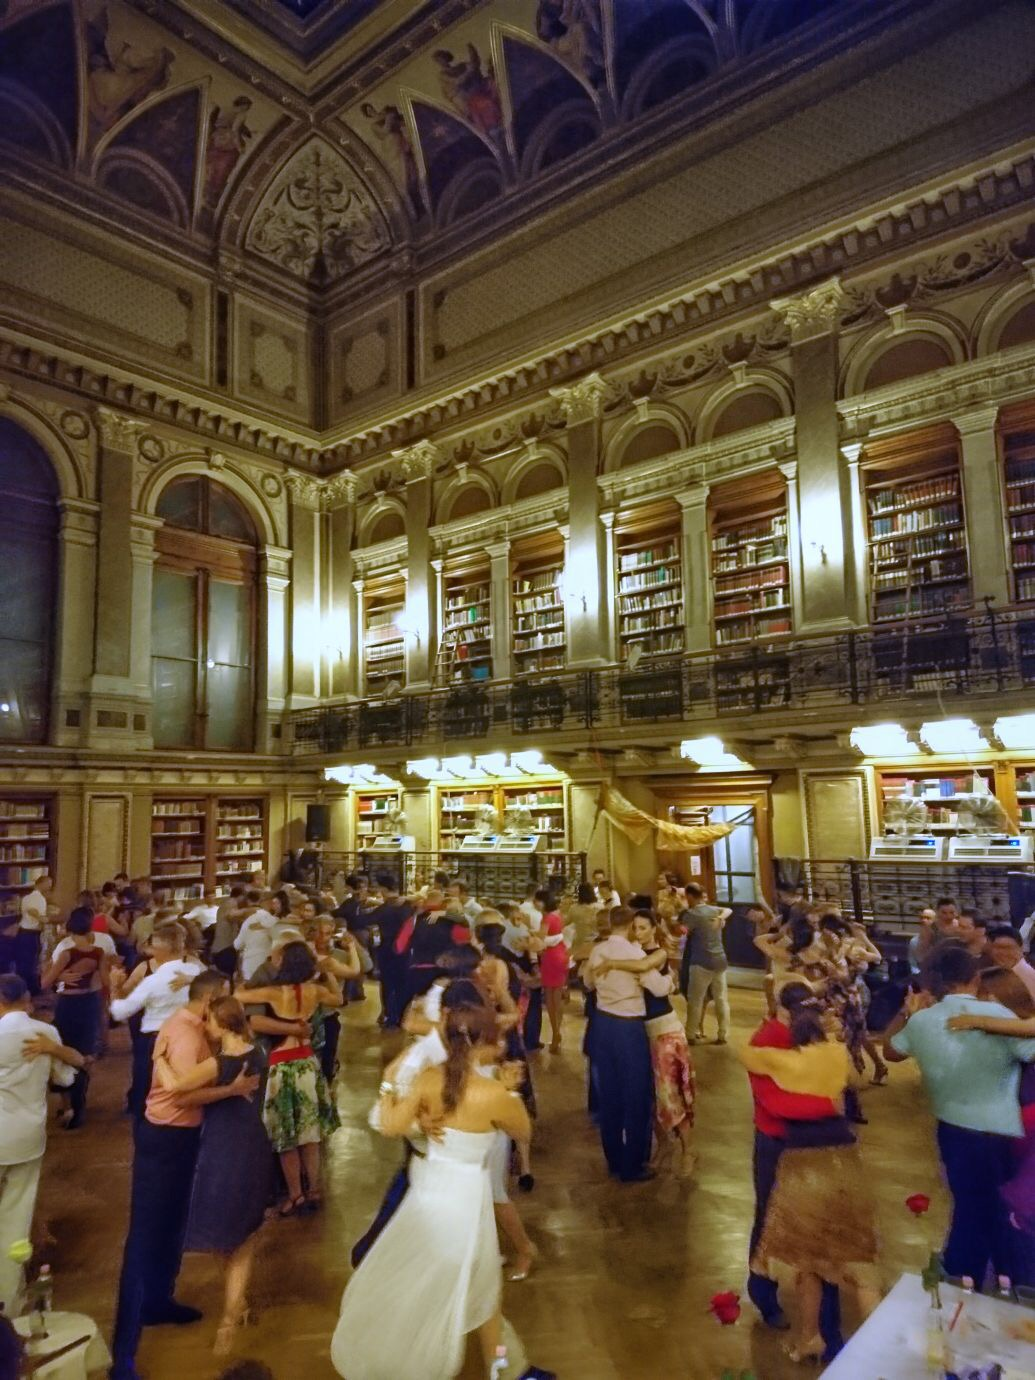 The Grande ELTE University Library